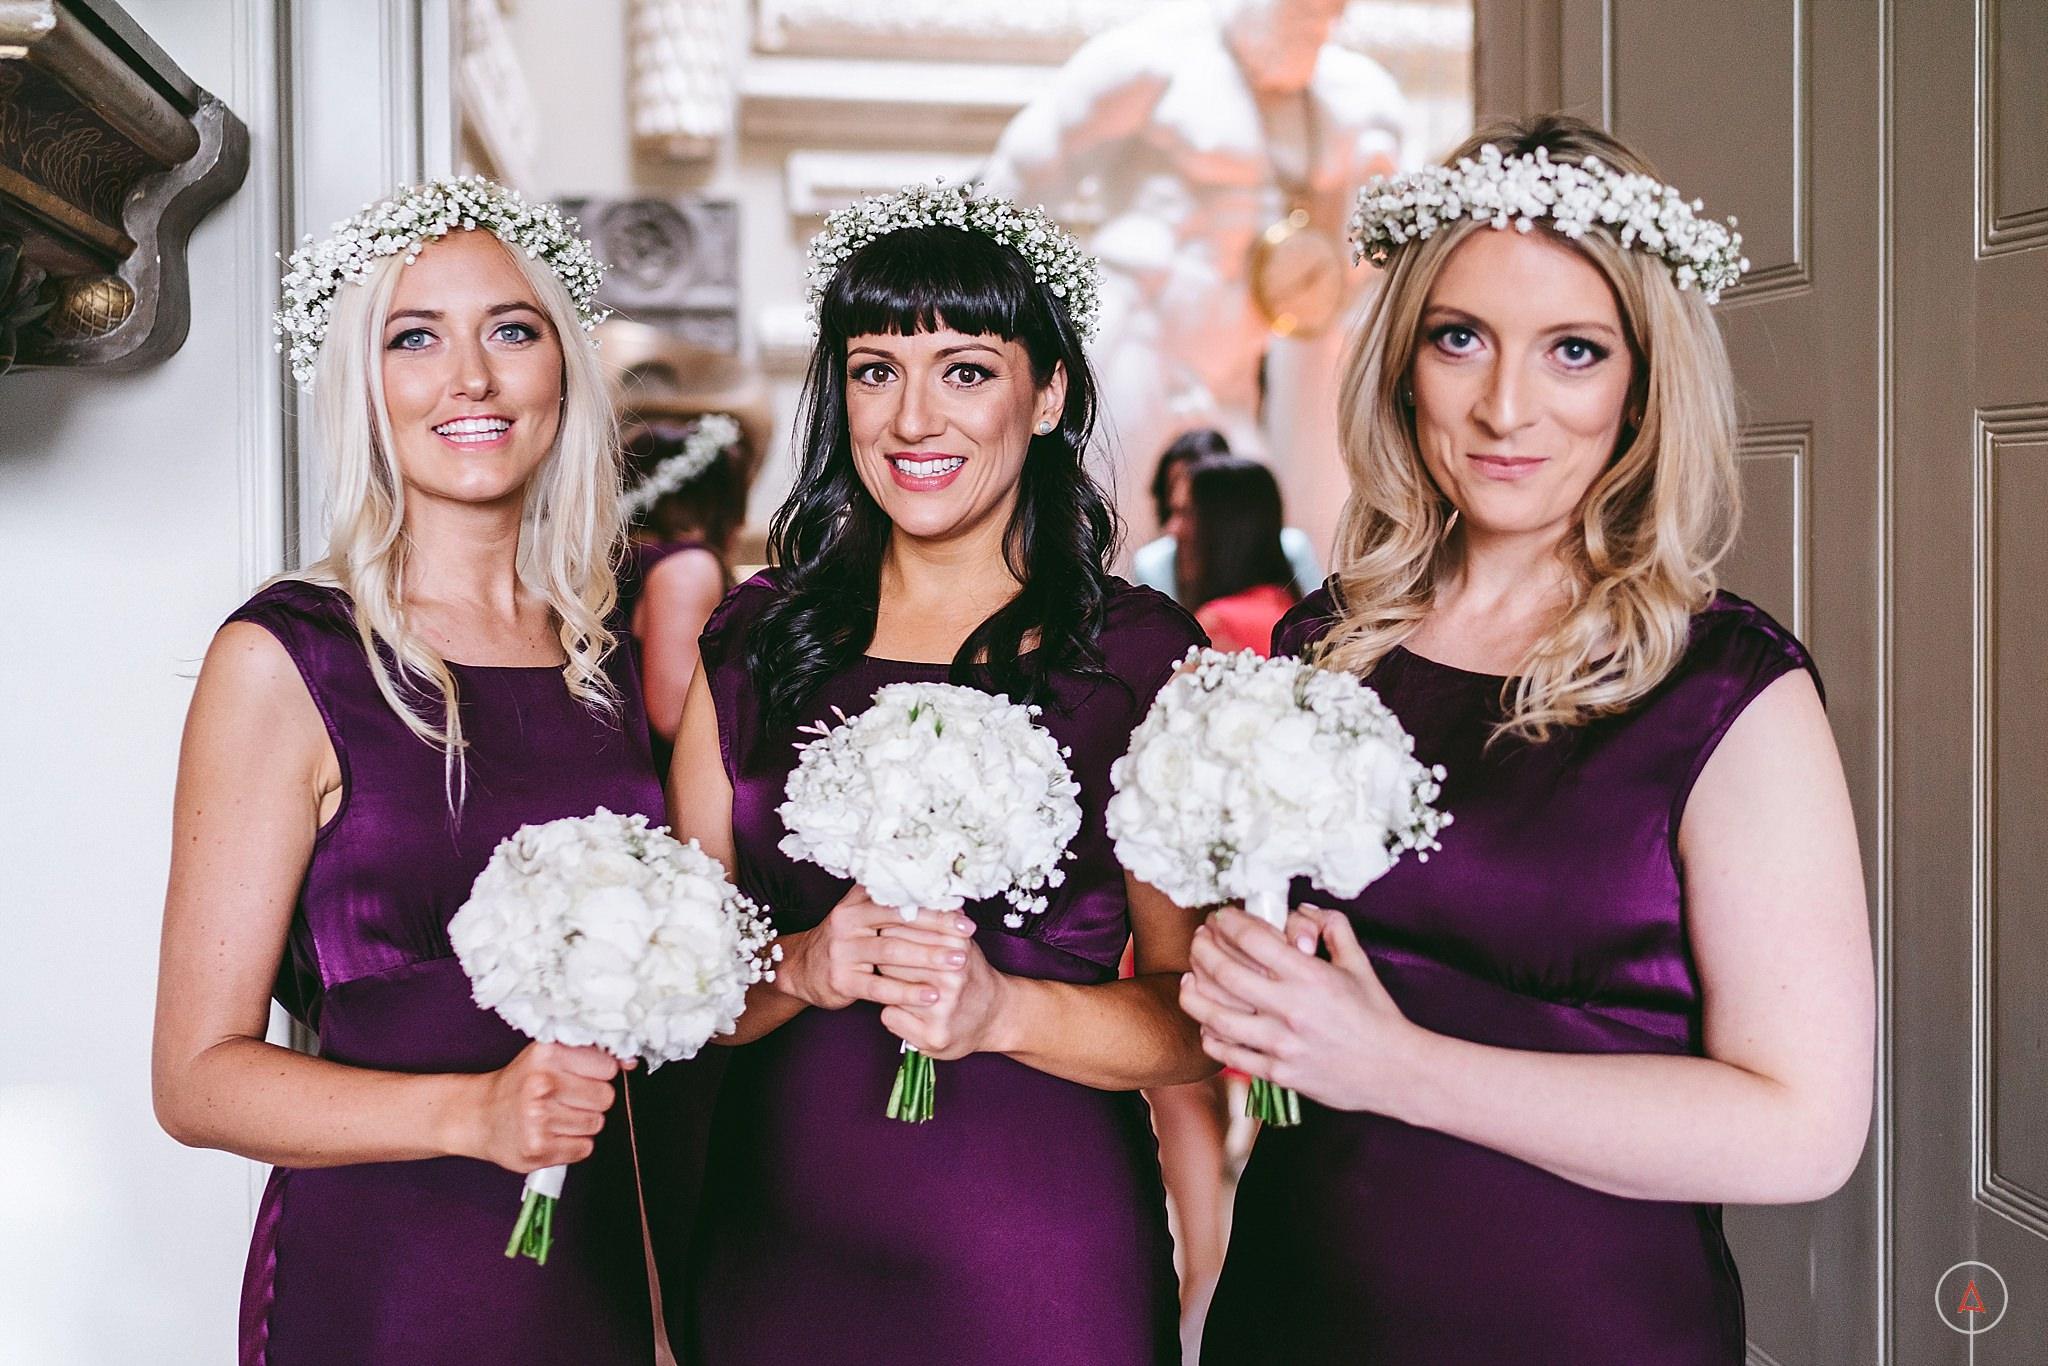 cardiff-wedding-photographer-aga-tomaszek_0248